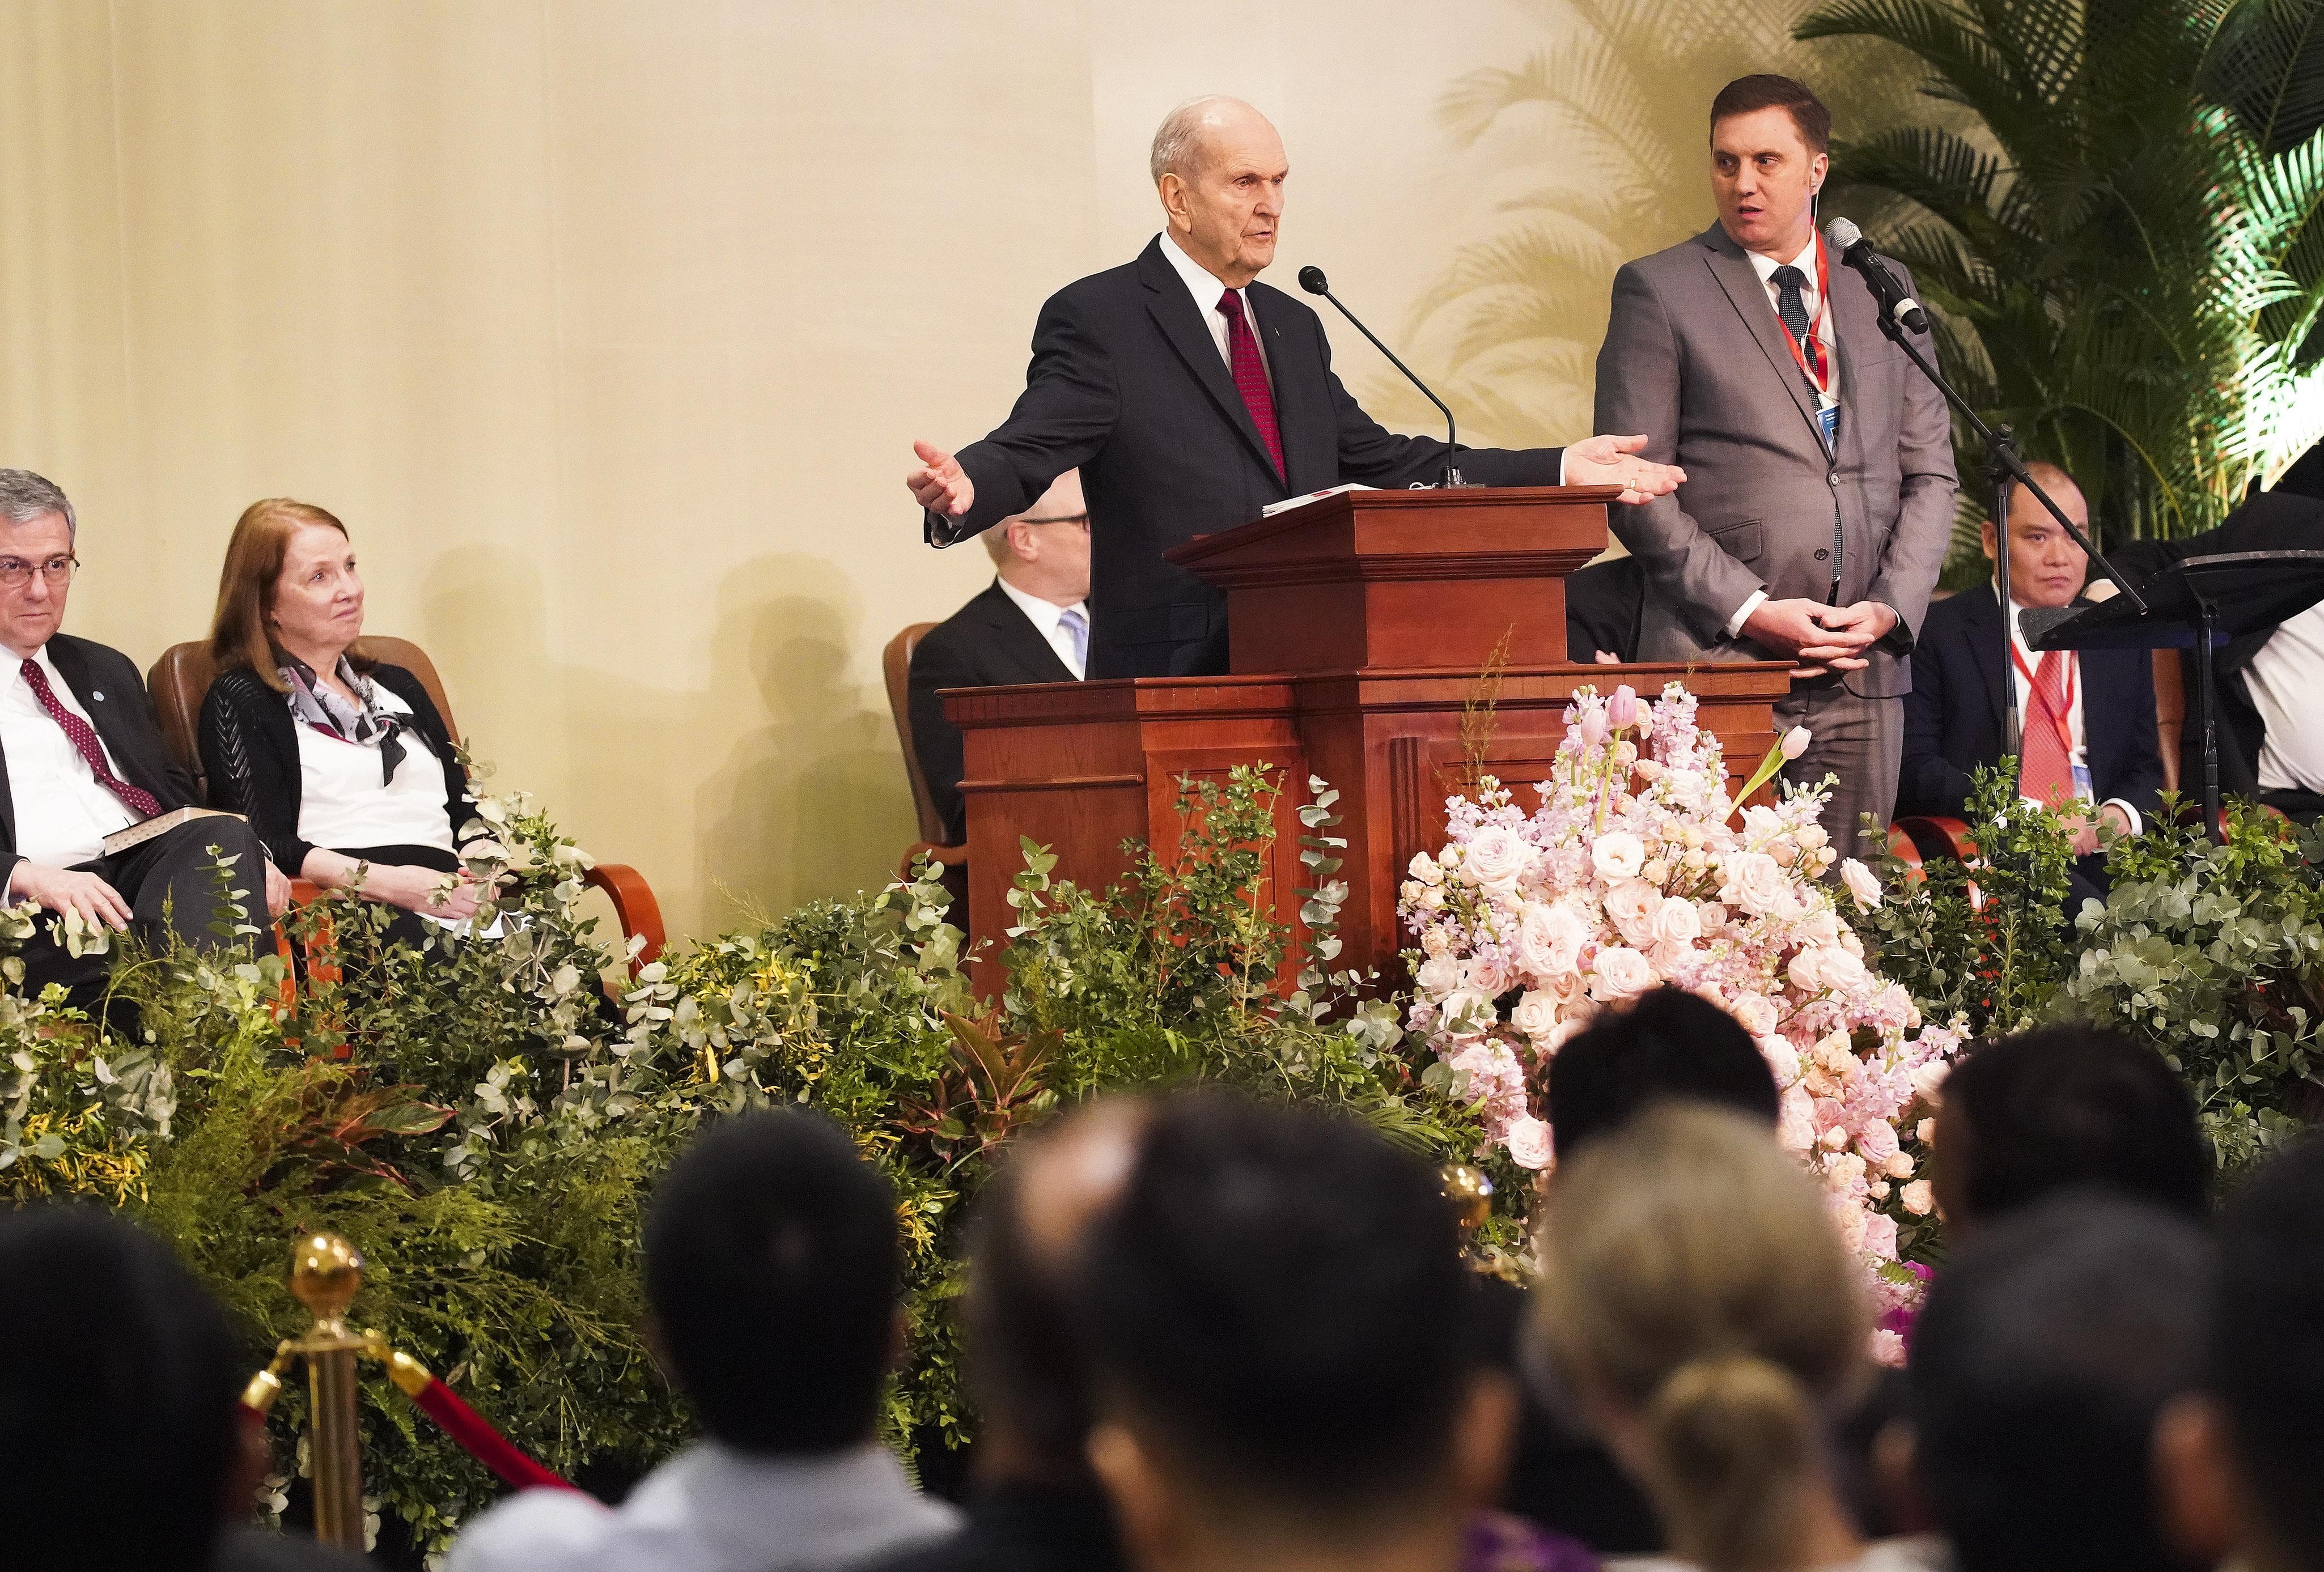 President Russell M. Nelson of The Church of Jesus Christ of Latter-day Saints speaks during a devotional in Hanoi, Vietnam, on Sunday, Nov. 17, 2019.